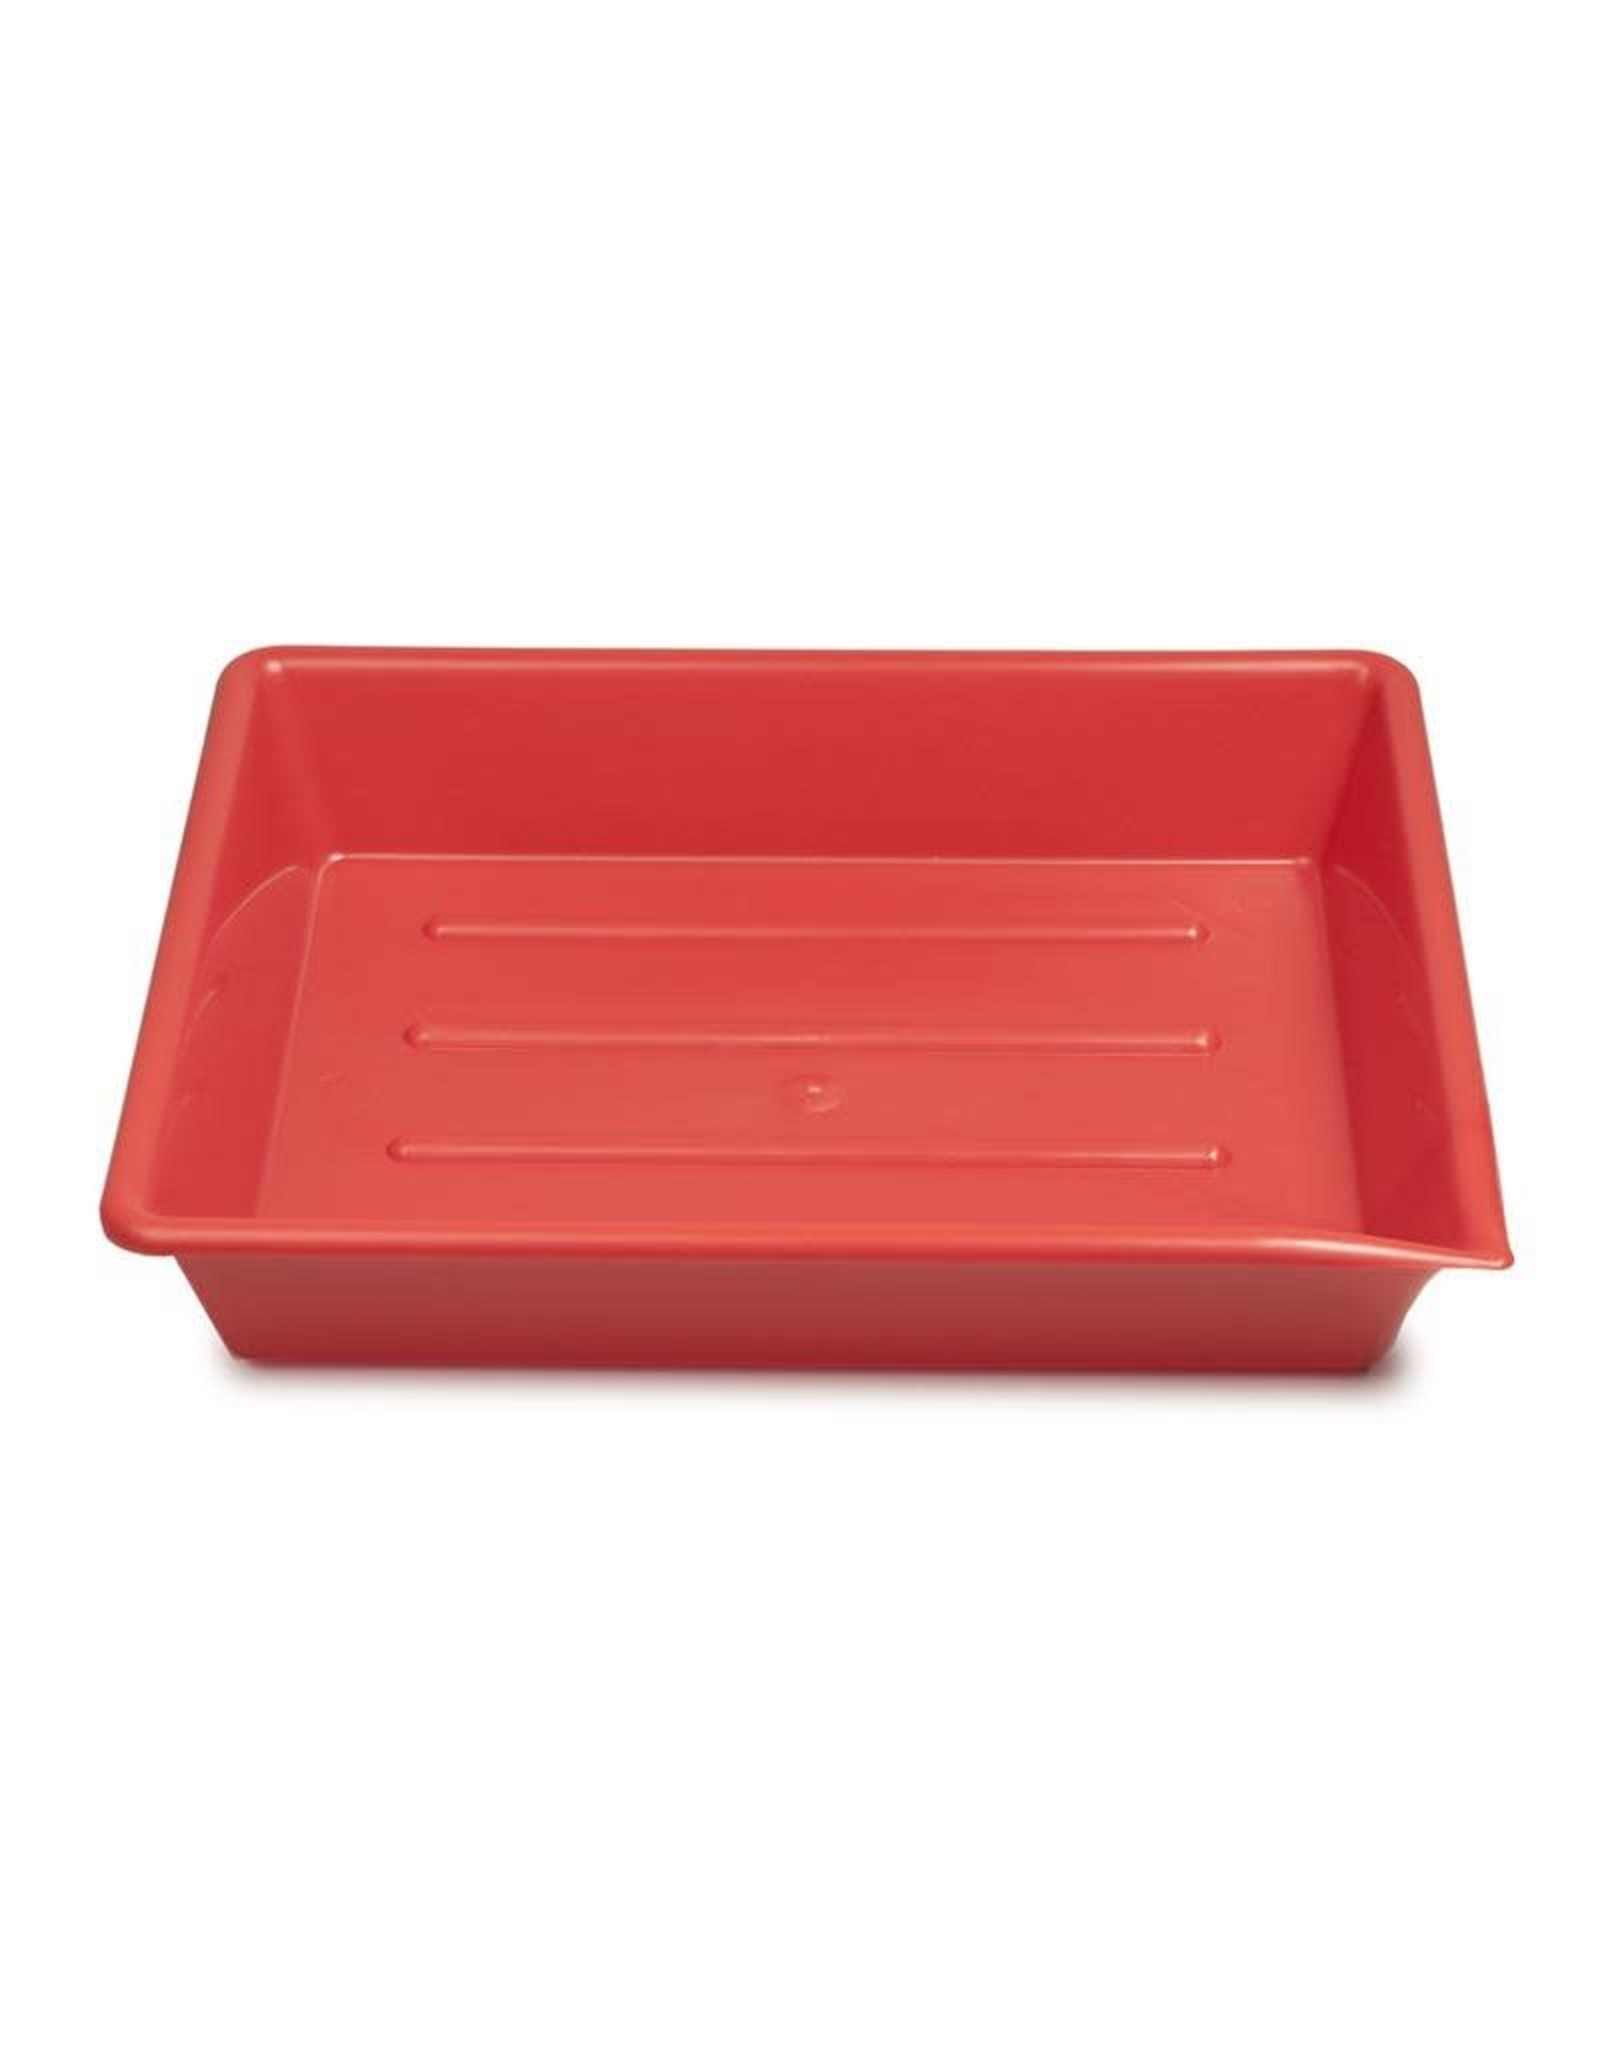 "Kaiser Kaiser Lab Tray, 20 x 25 cm (7.9 x 9.8""), red"